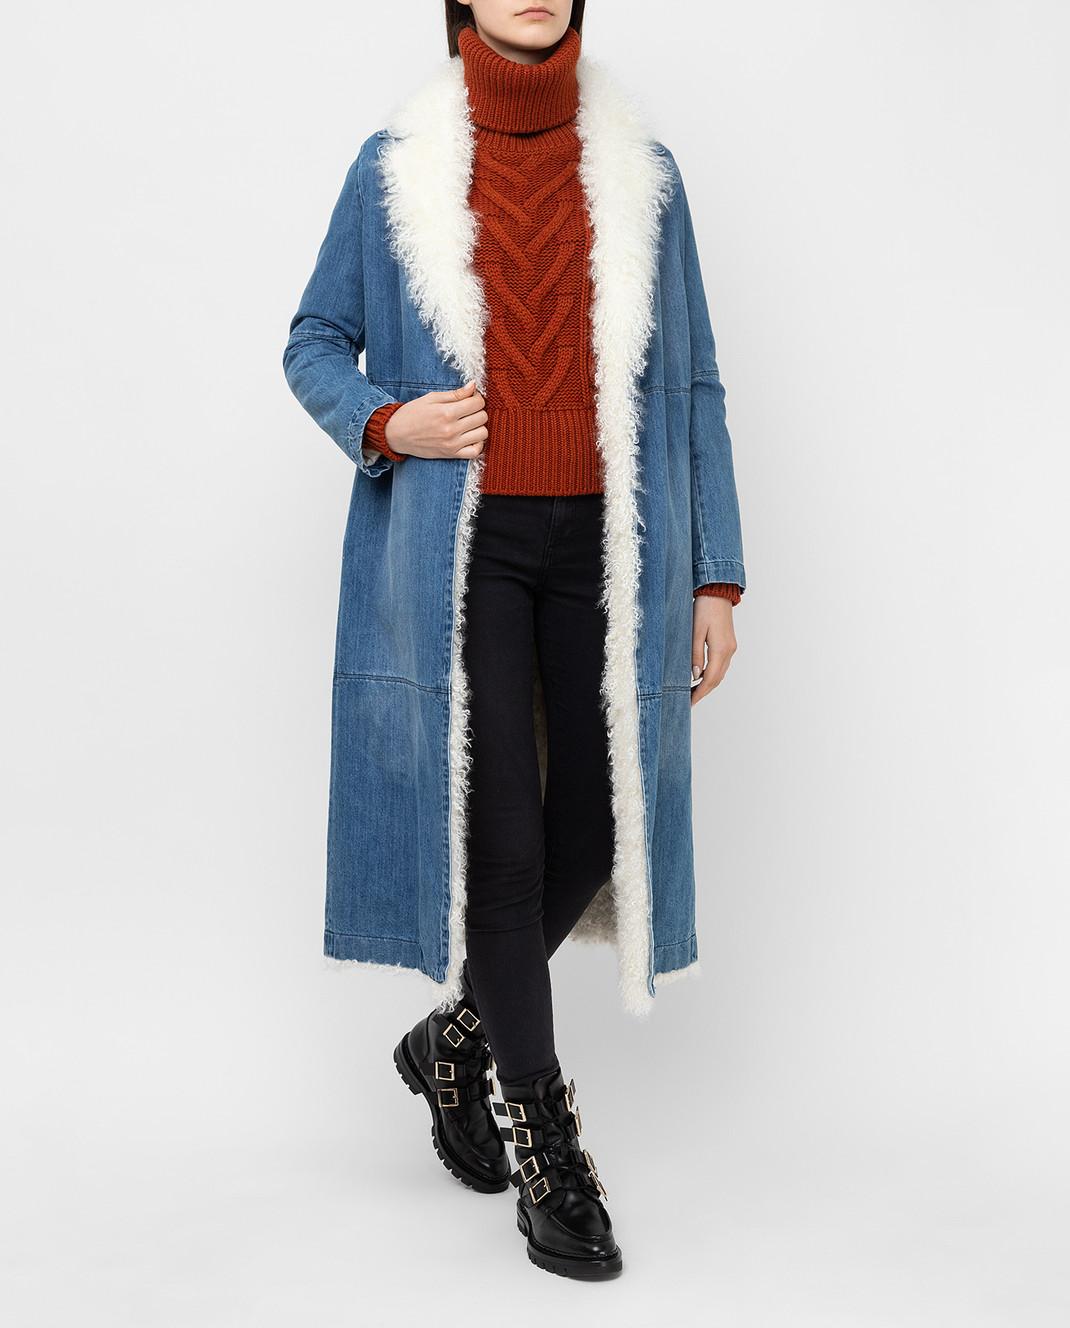 Simonetta Ravizza Синее джинсовое пальто VASIA3 изображение 2